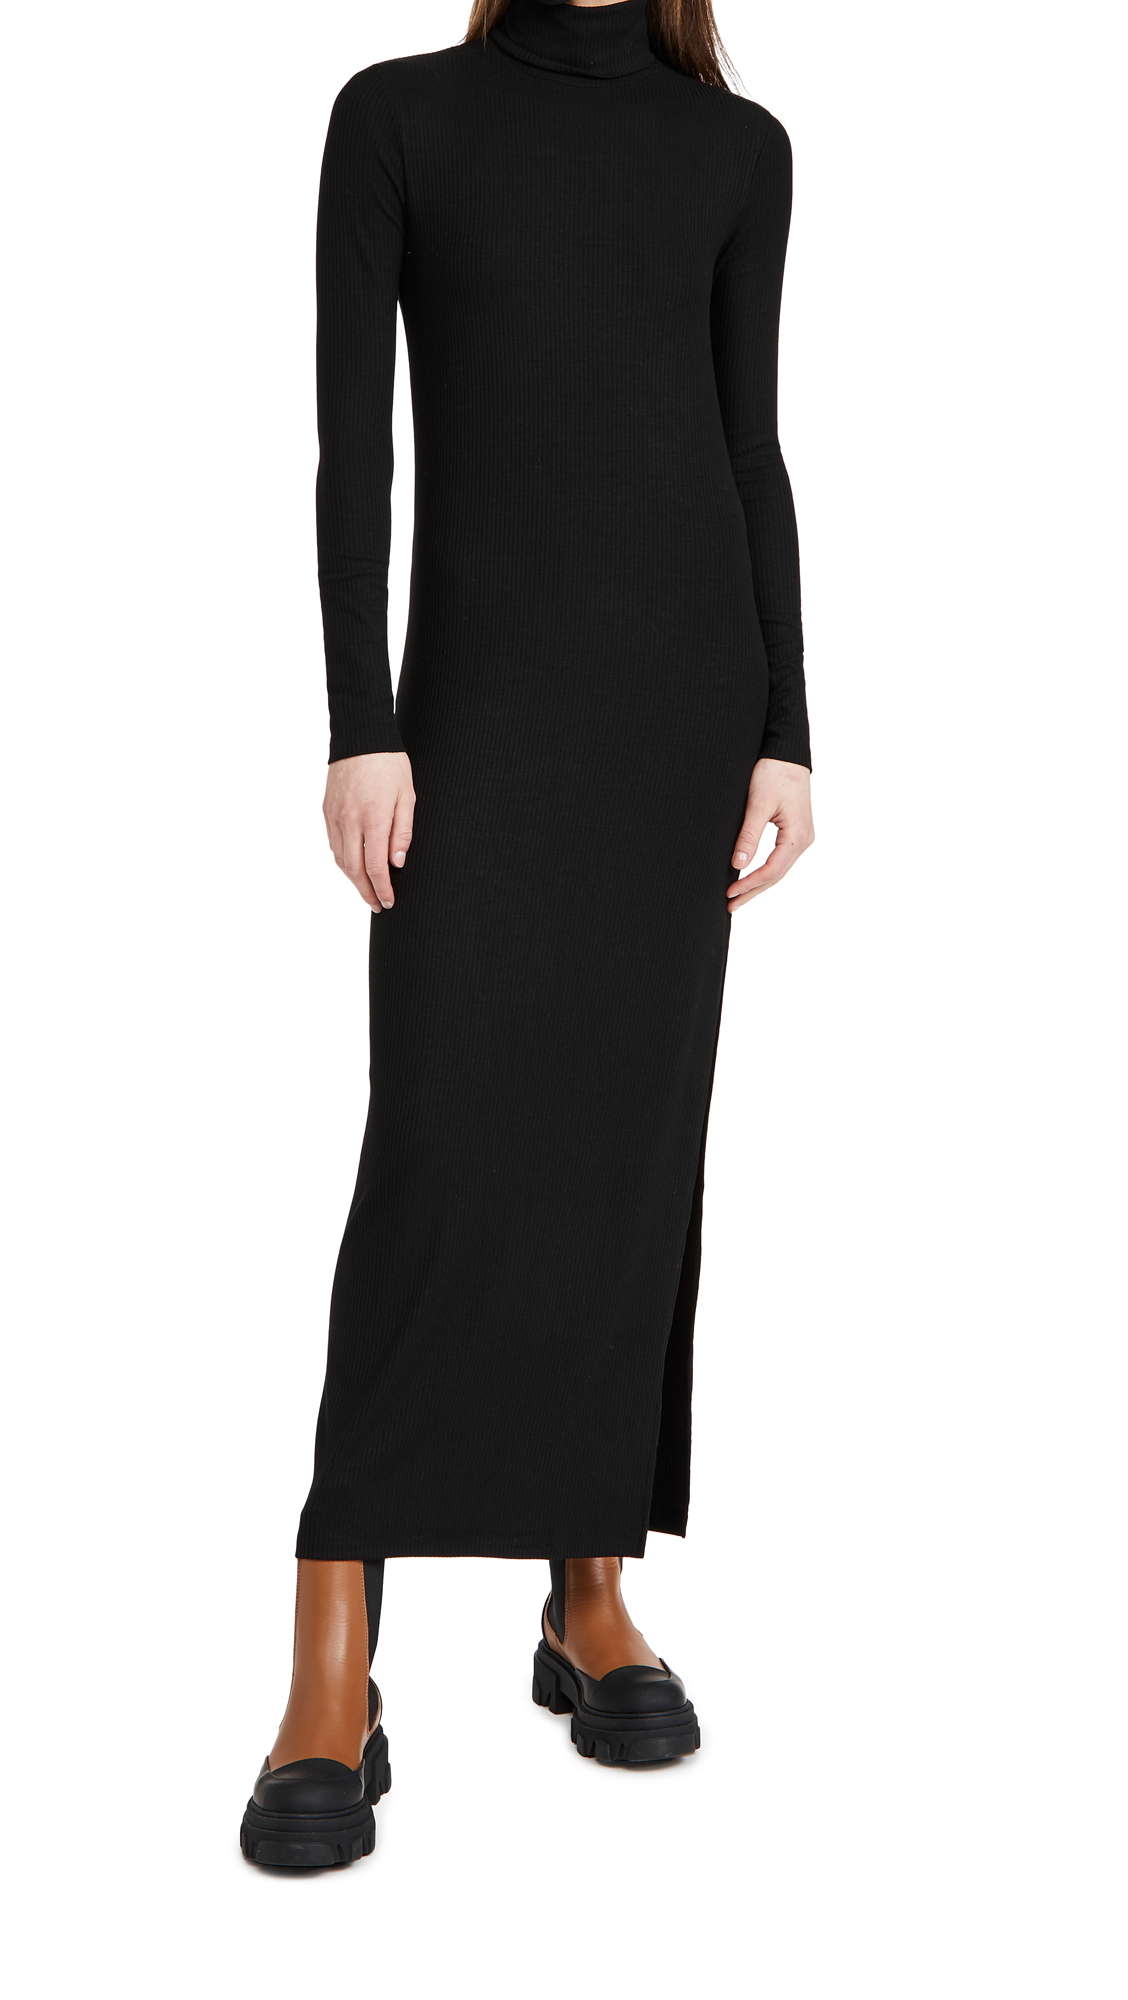 Ninety Percent + Net Sustain Cutout Stretch-knit Turtleneck Midi Dress In Black